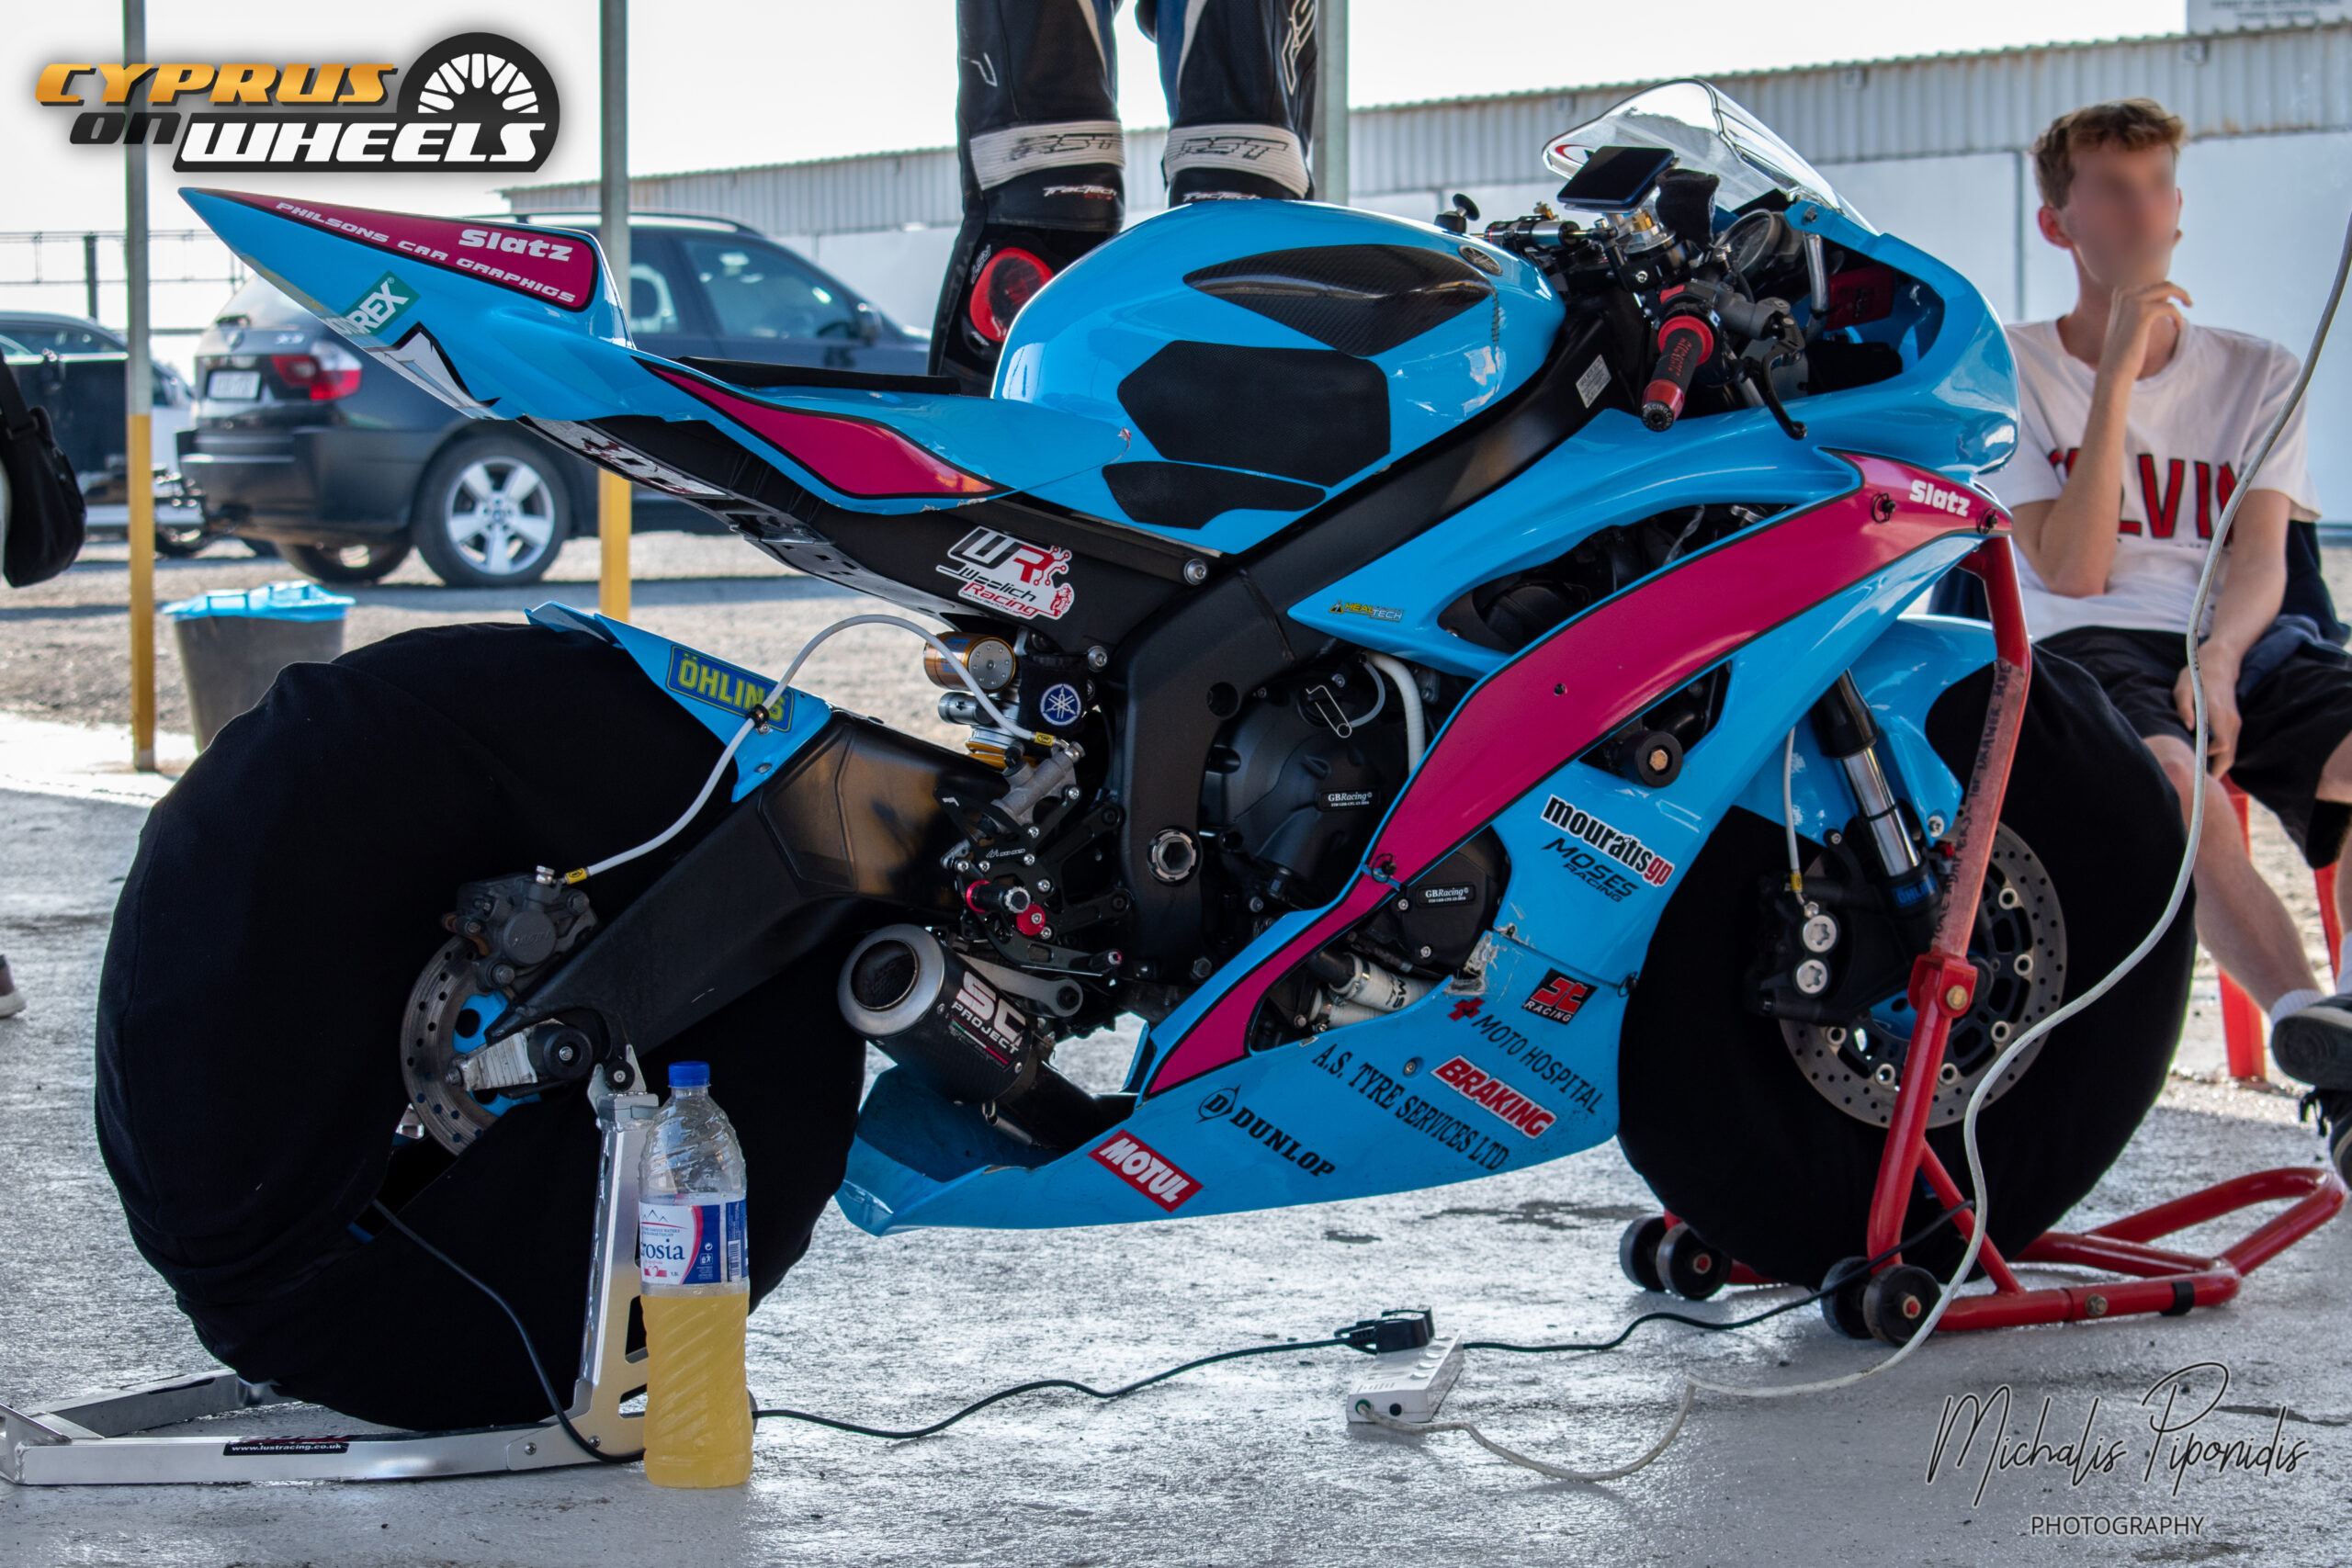 Teal superbike pit stop